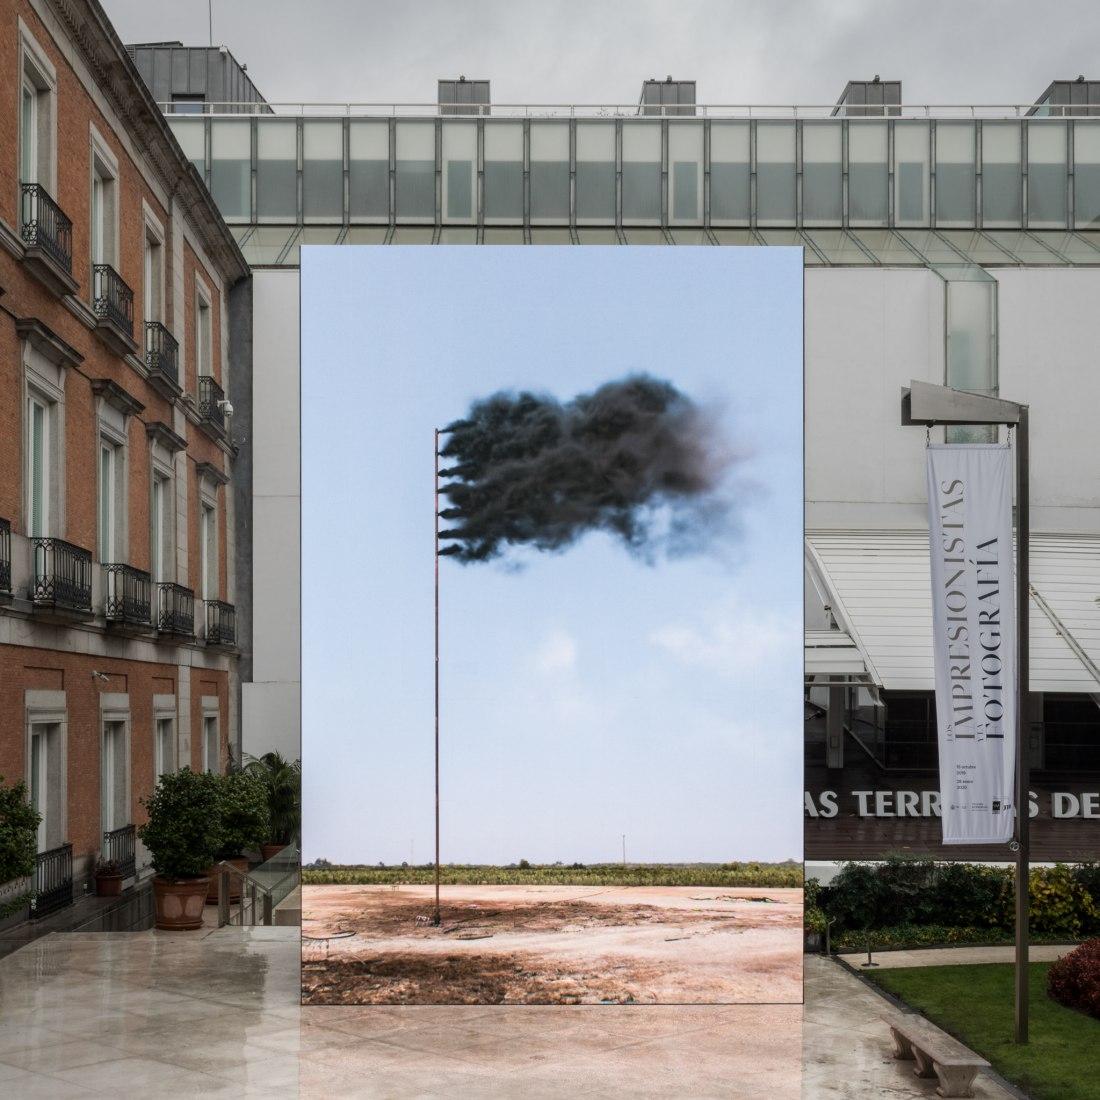 Installation view: John Gerrard, Western Flag (Sindletop, Texas) 2017, Museo Nacional Thyssen-Bornemisza, Madrid, Spain, 2019. Photograph by Roberto Ruiz | TBA21